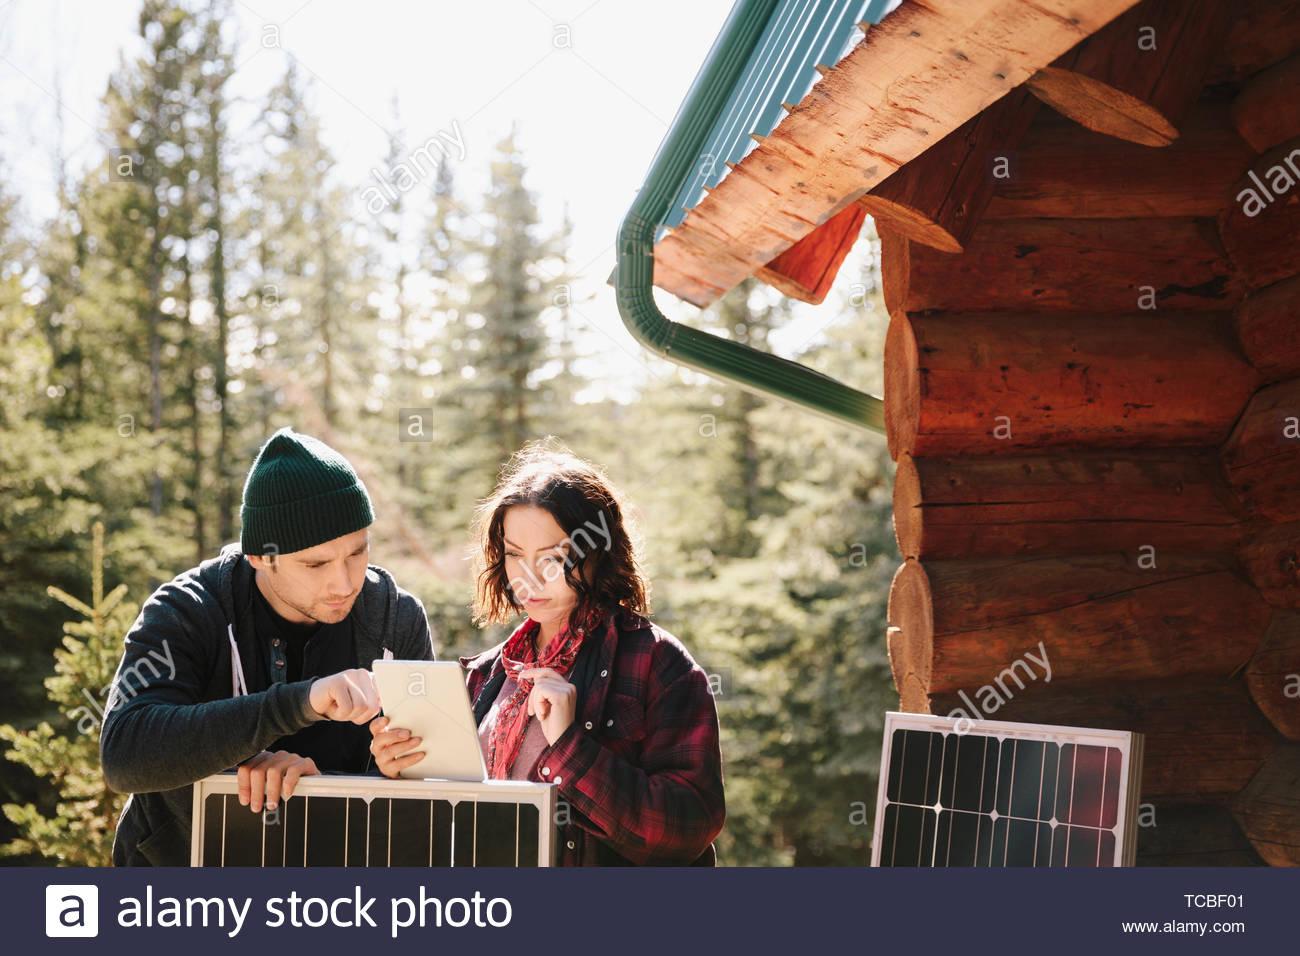 Couple using digital tablet, installing solar panels outside cabin - Stock Image